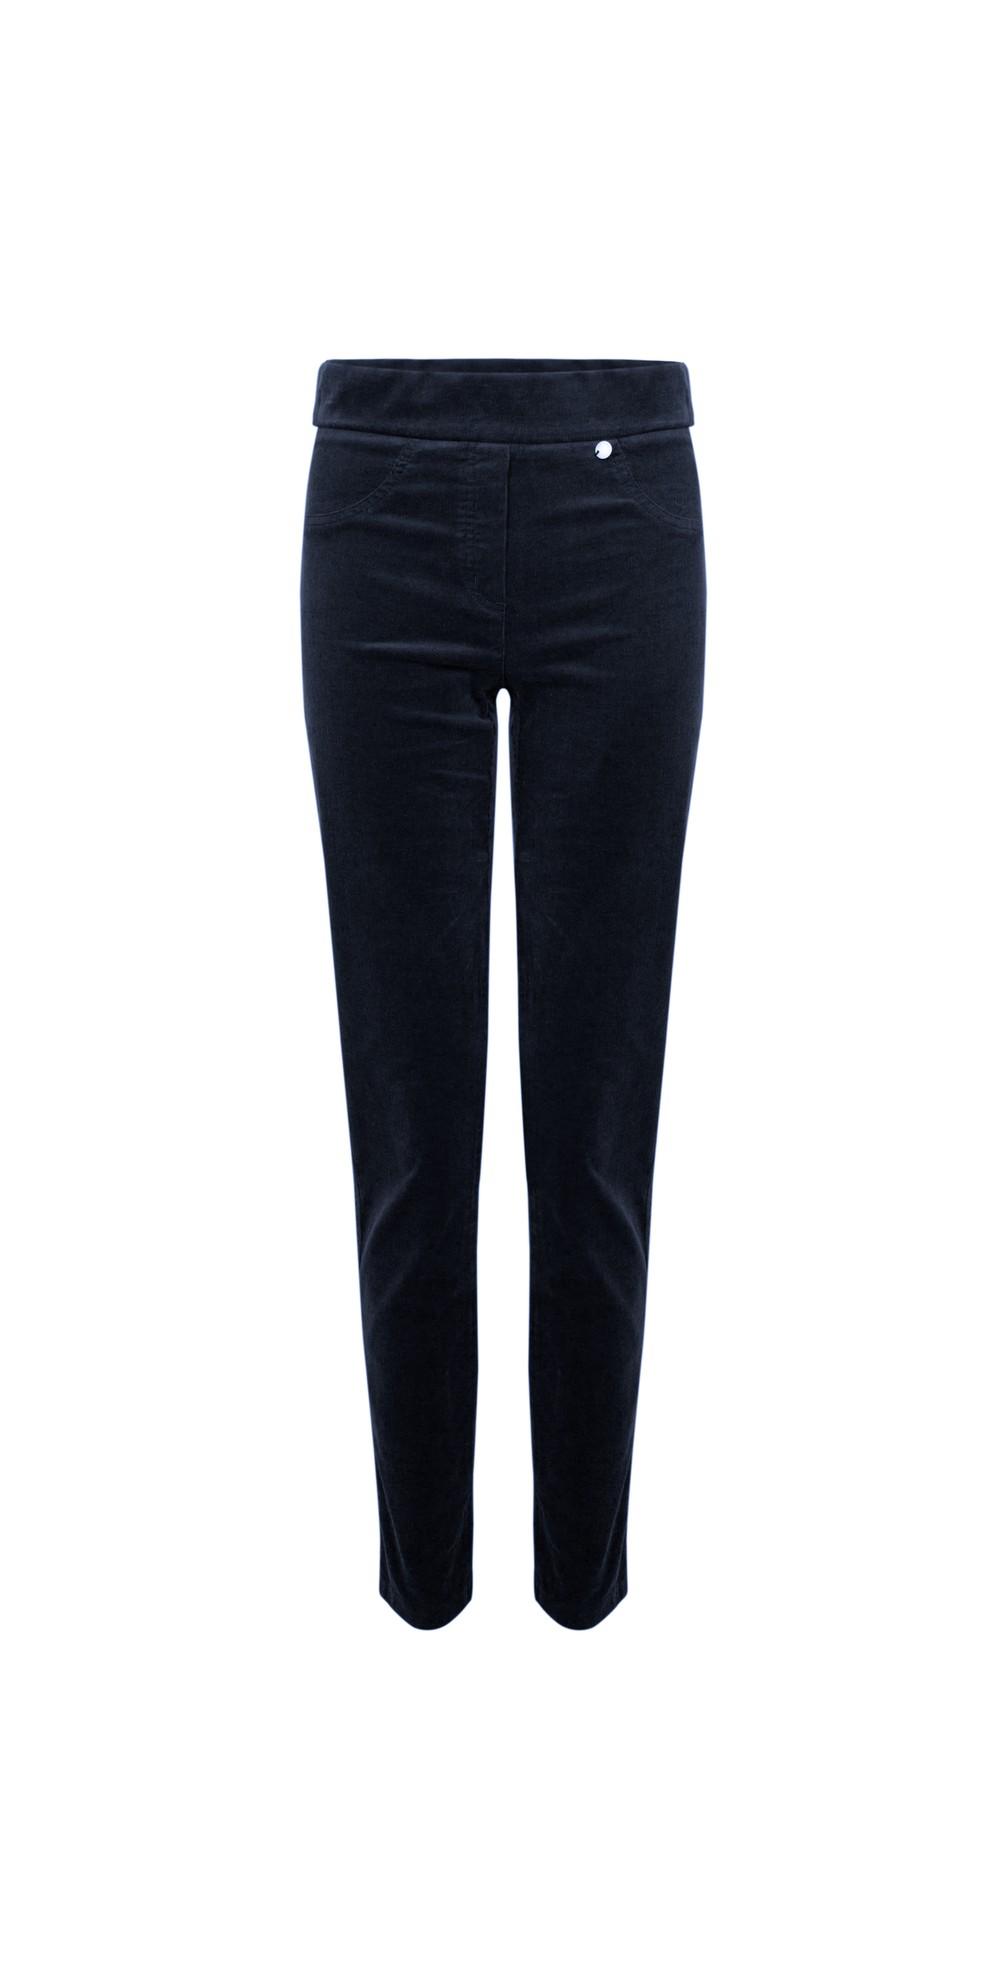 Rose Navy NeedleCord Slimfit Trousers main image